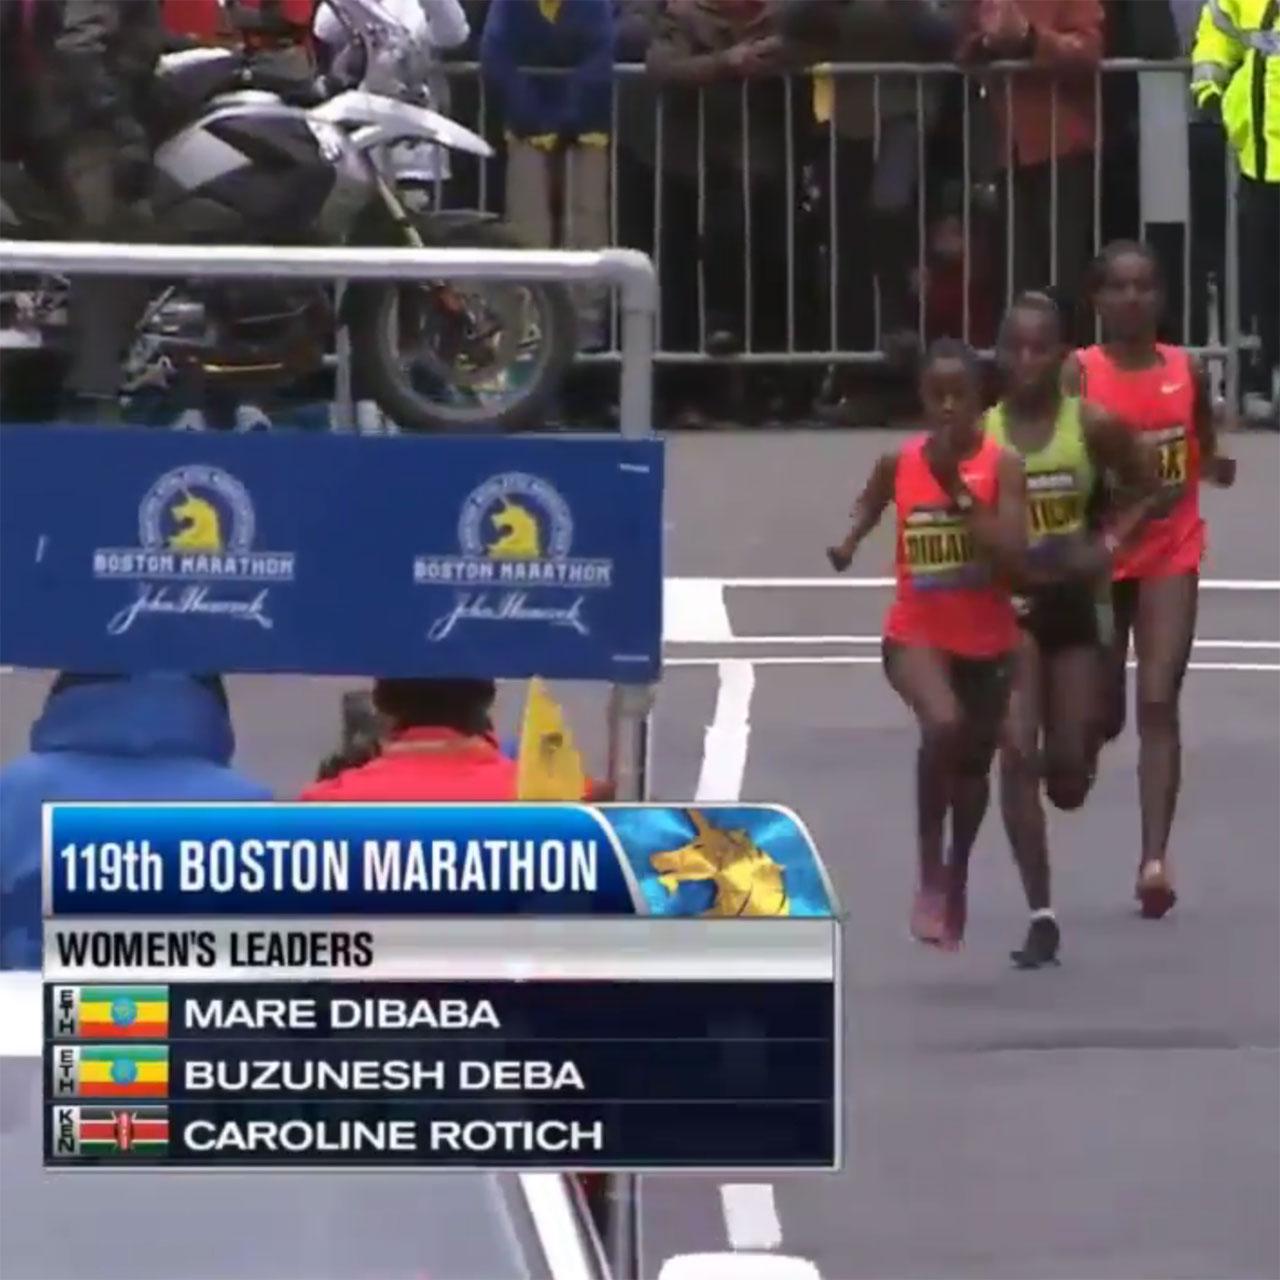 2015 Boston Marathon top three women: Caroline Rotich, Mare Dibaba and Buzunesh Deba